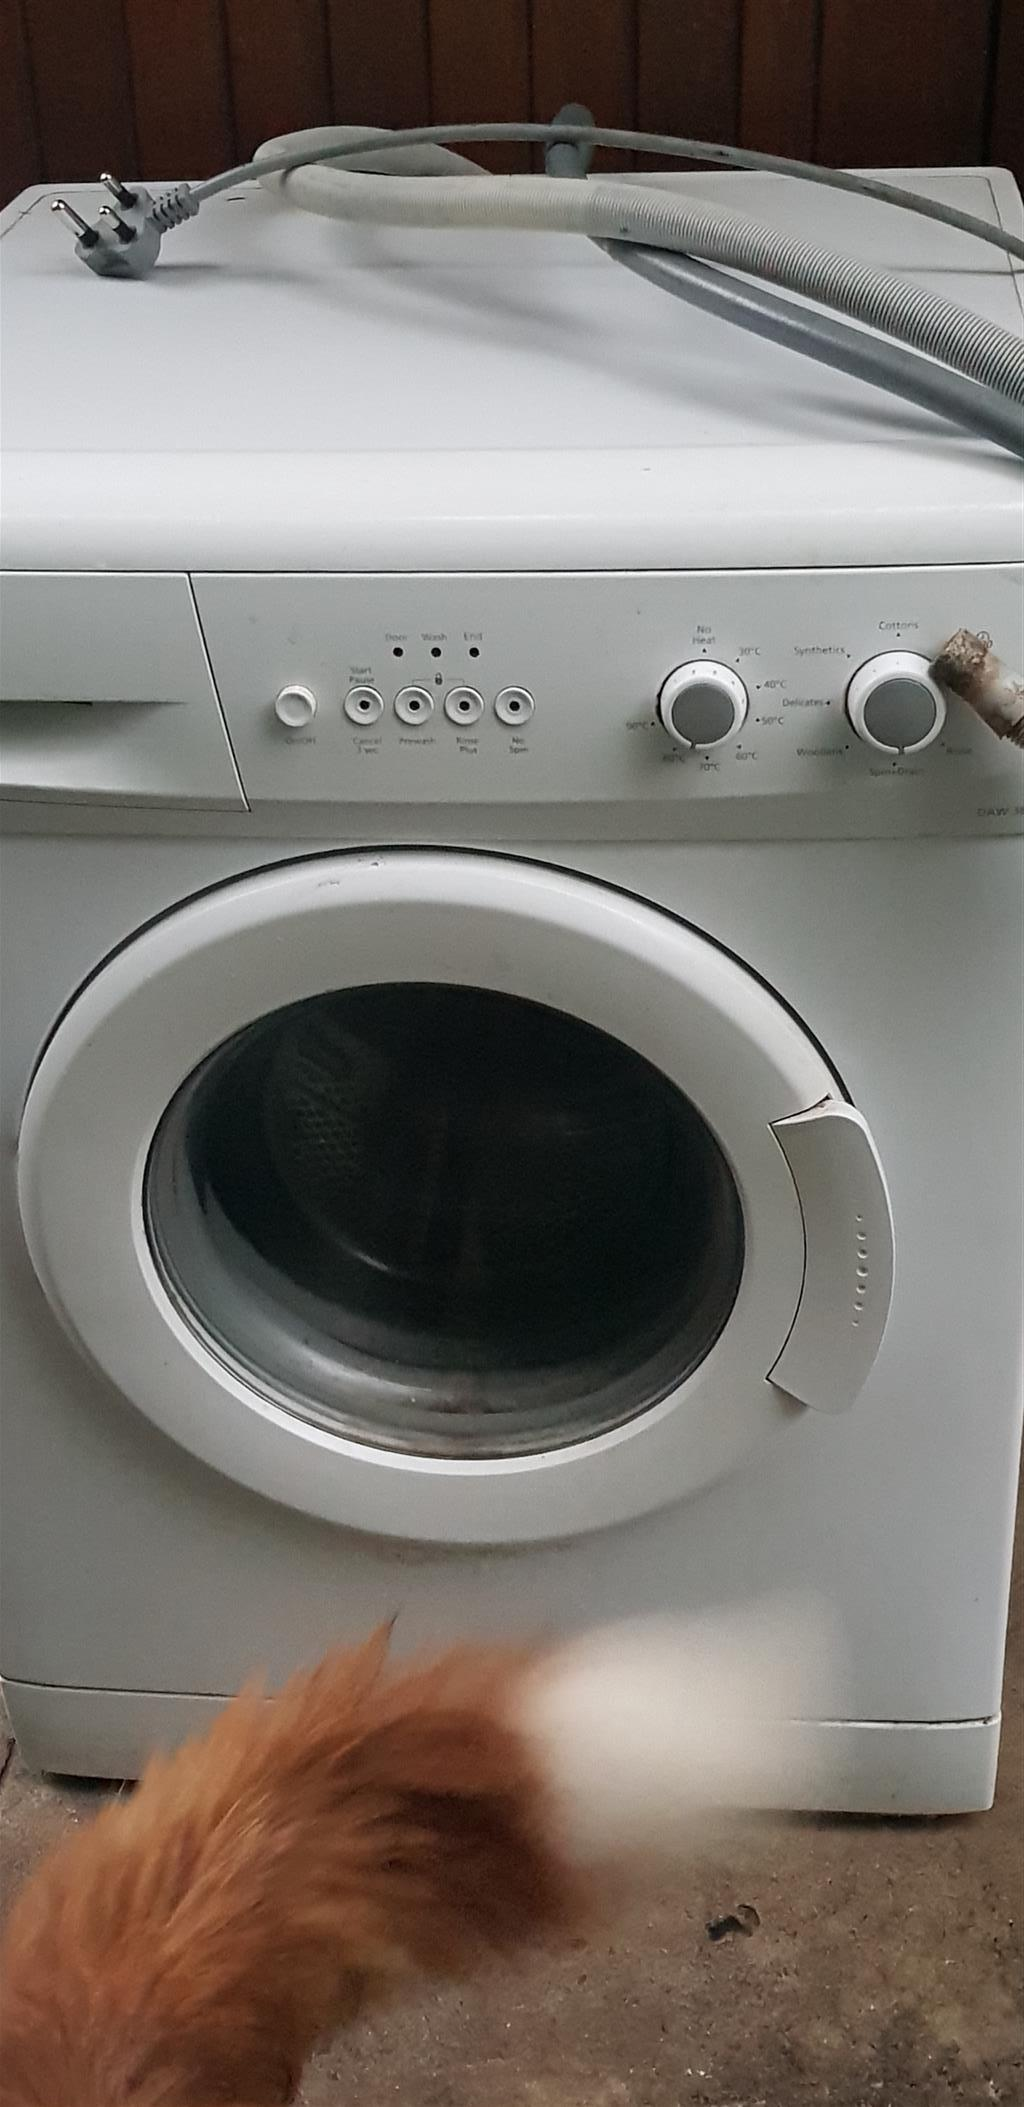 Washing machine & fridge